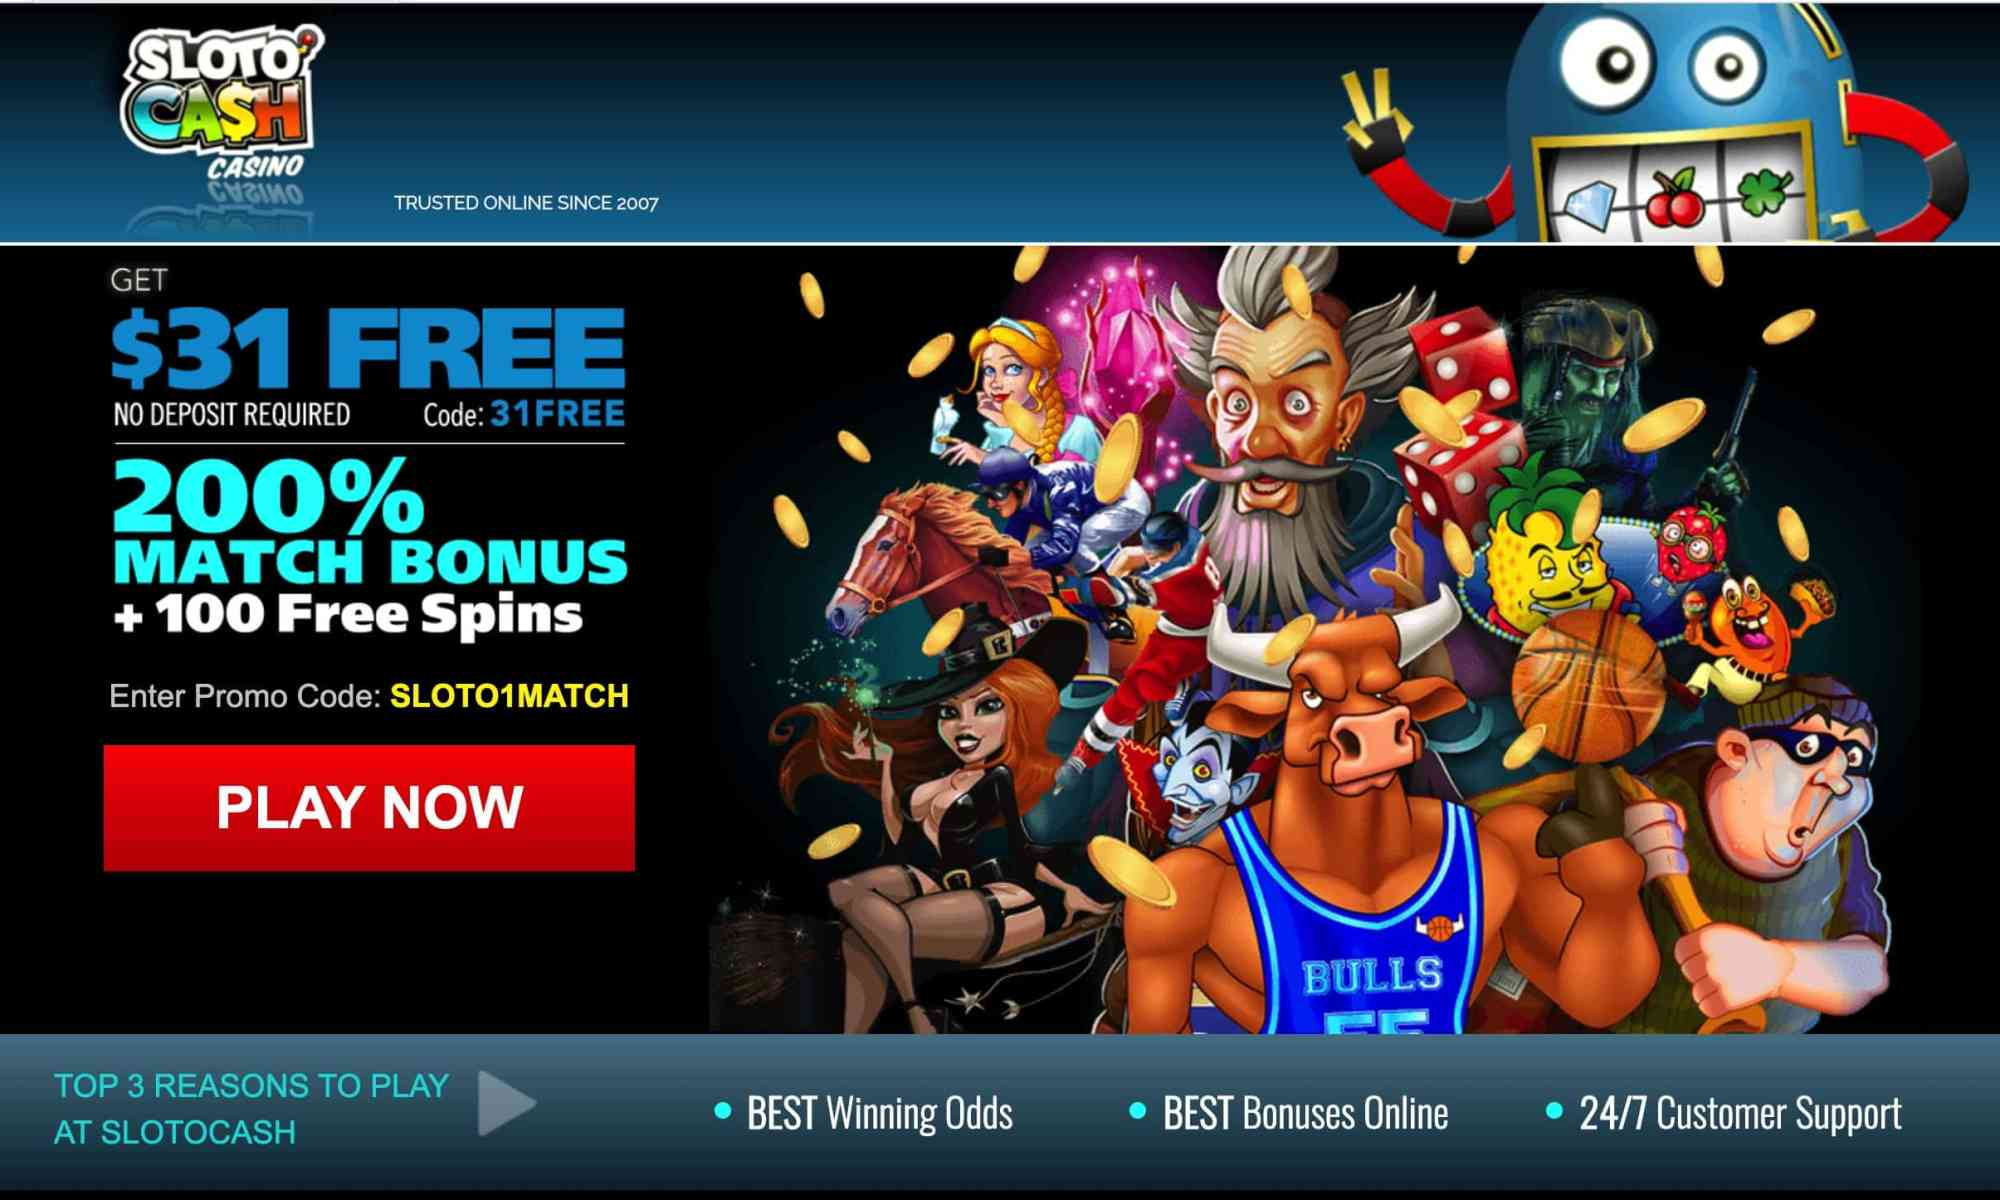 Slotocash Casino - $31 Free + 200 % Bonus + Spins